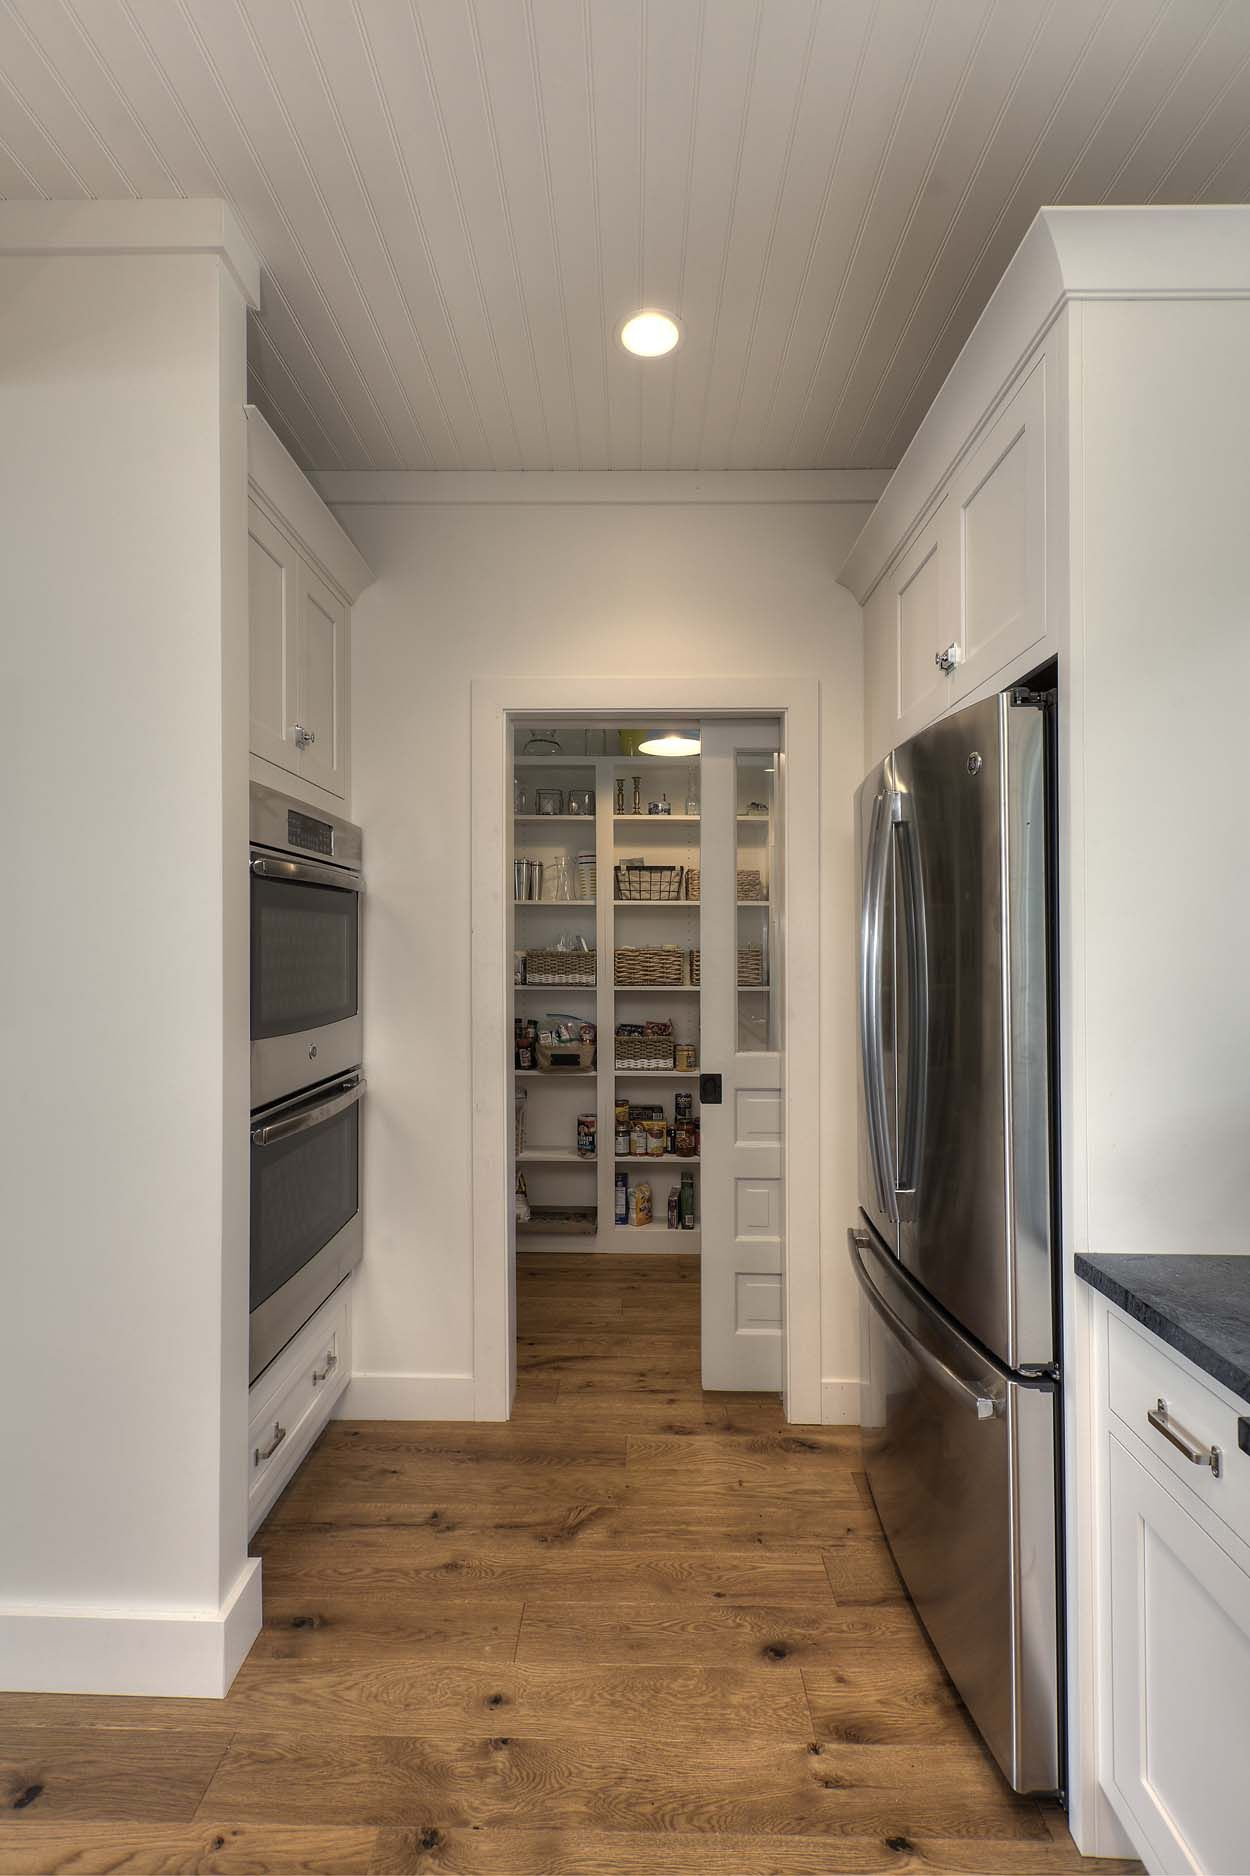 A Kitchen In Traverse City Michigan Was Designed To Supreme Perfection Angela Goodall Kitchen Design Trends Kitchen Cabinets In Bathroom Kitchen Design Small